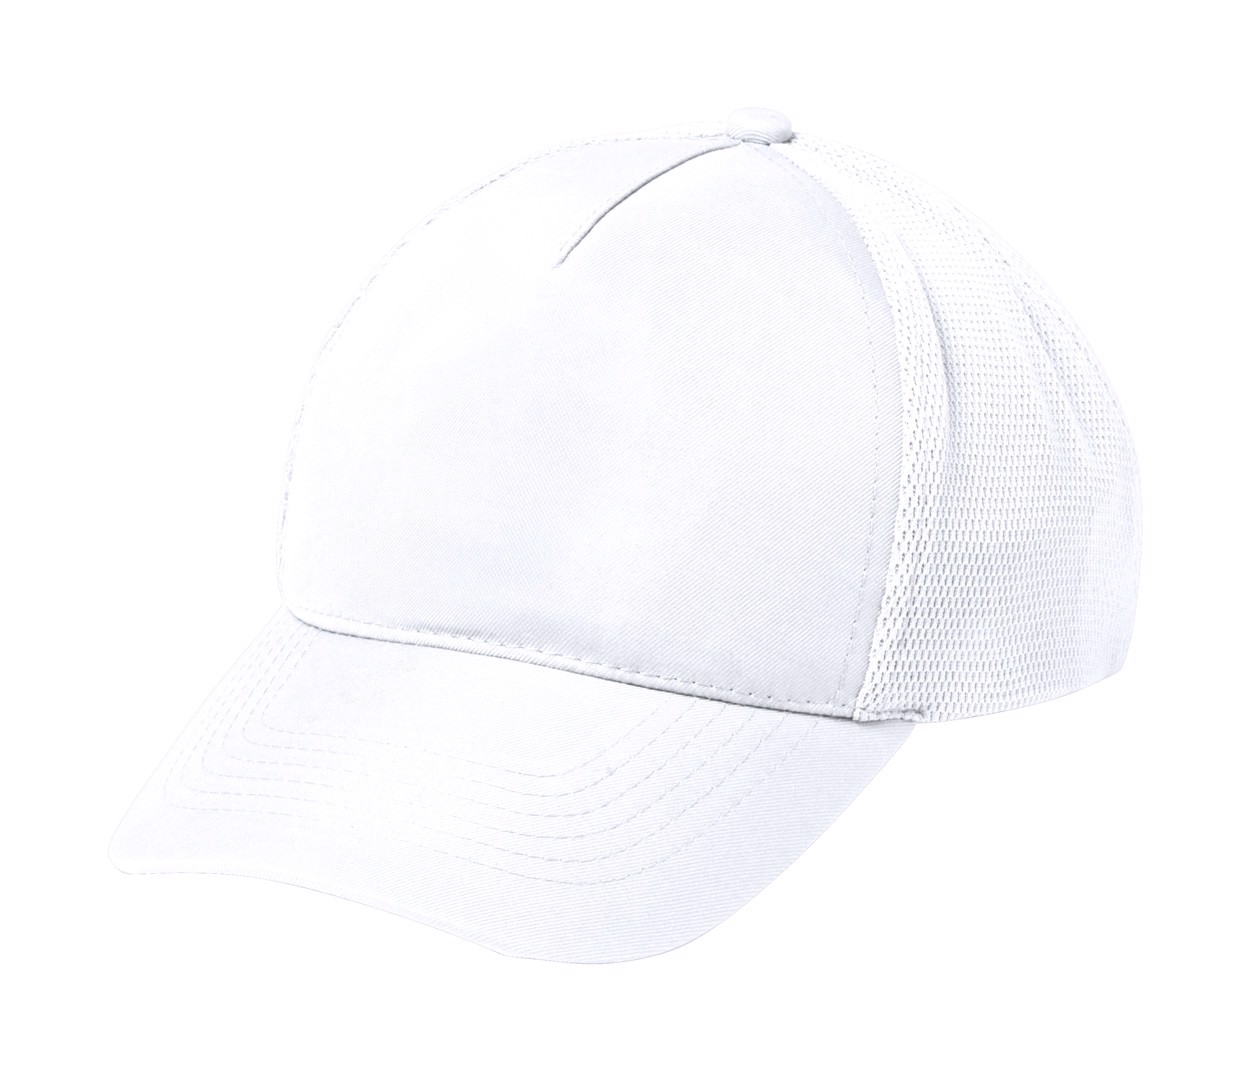 Baseballová Čepice Karif - Bílá